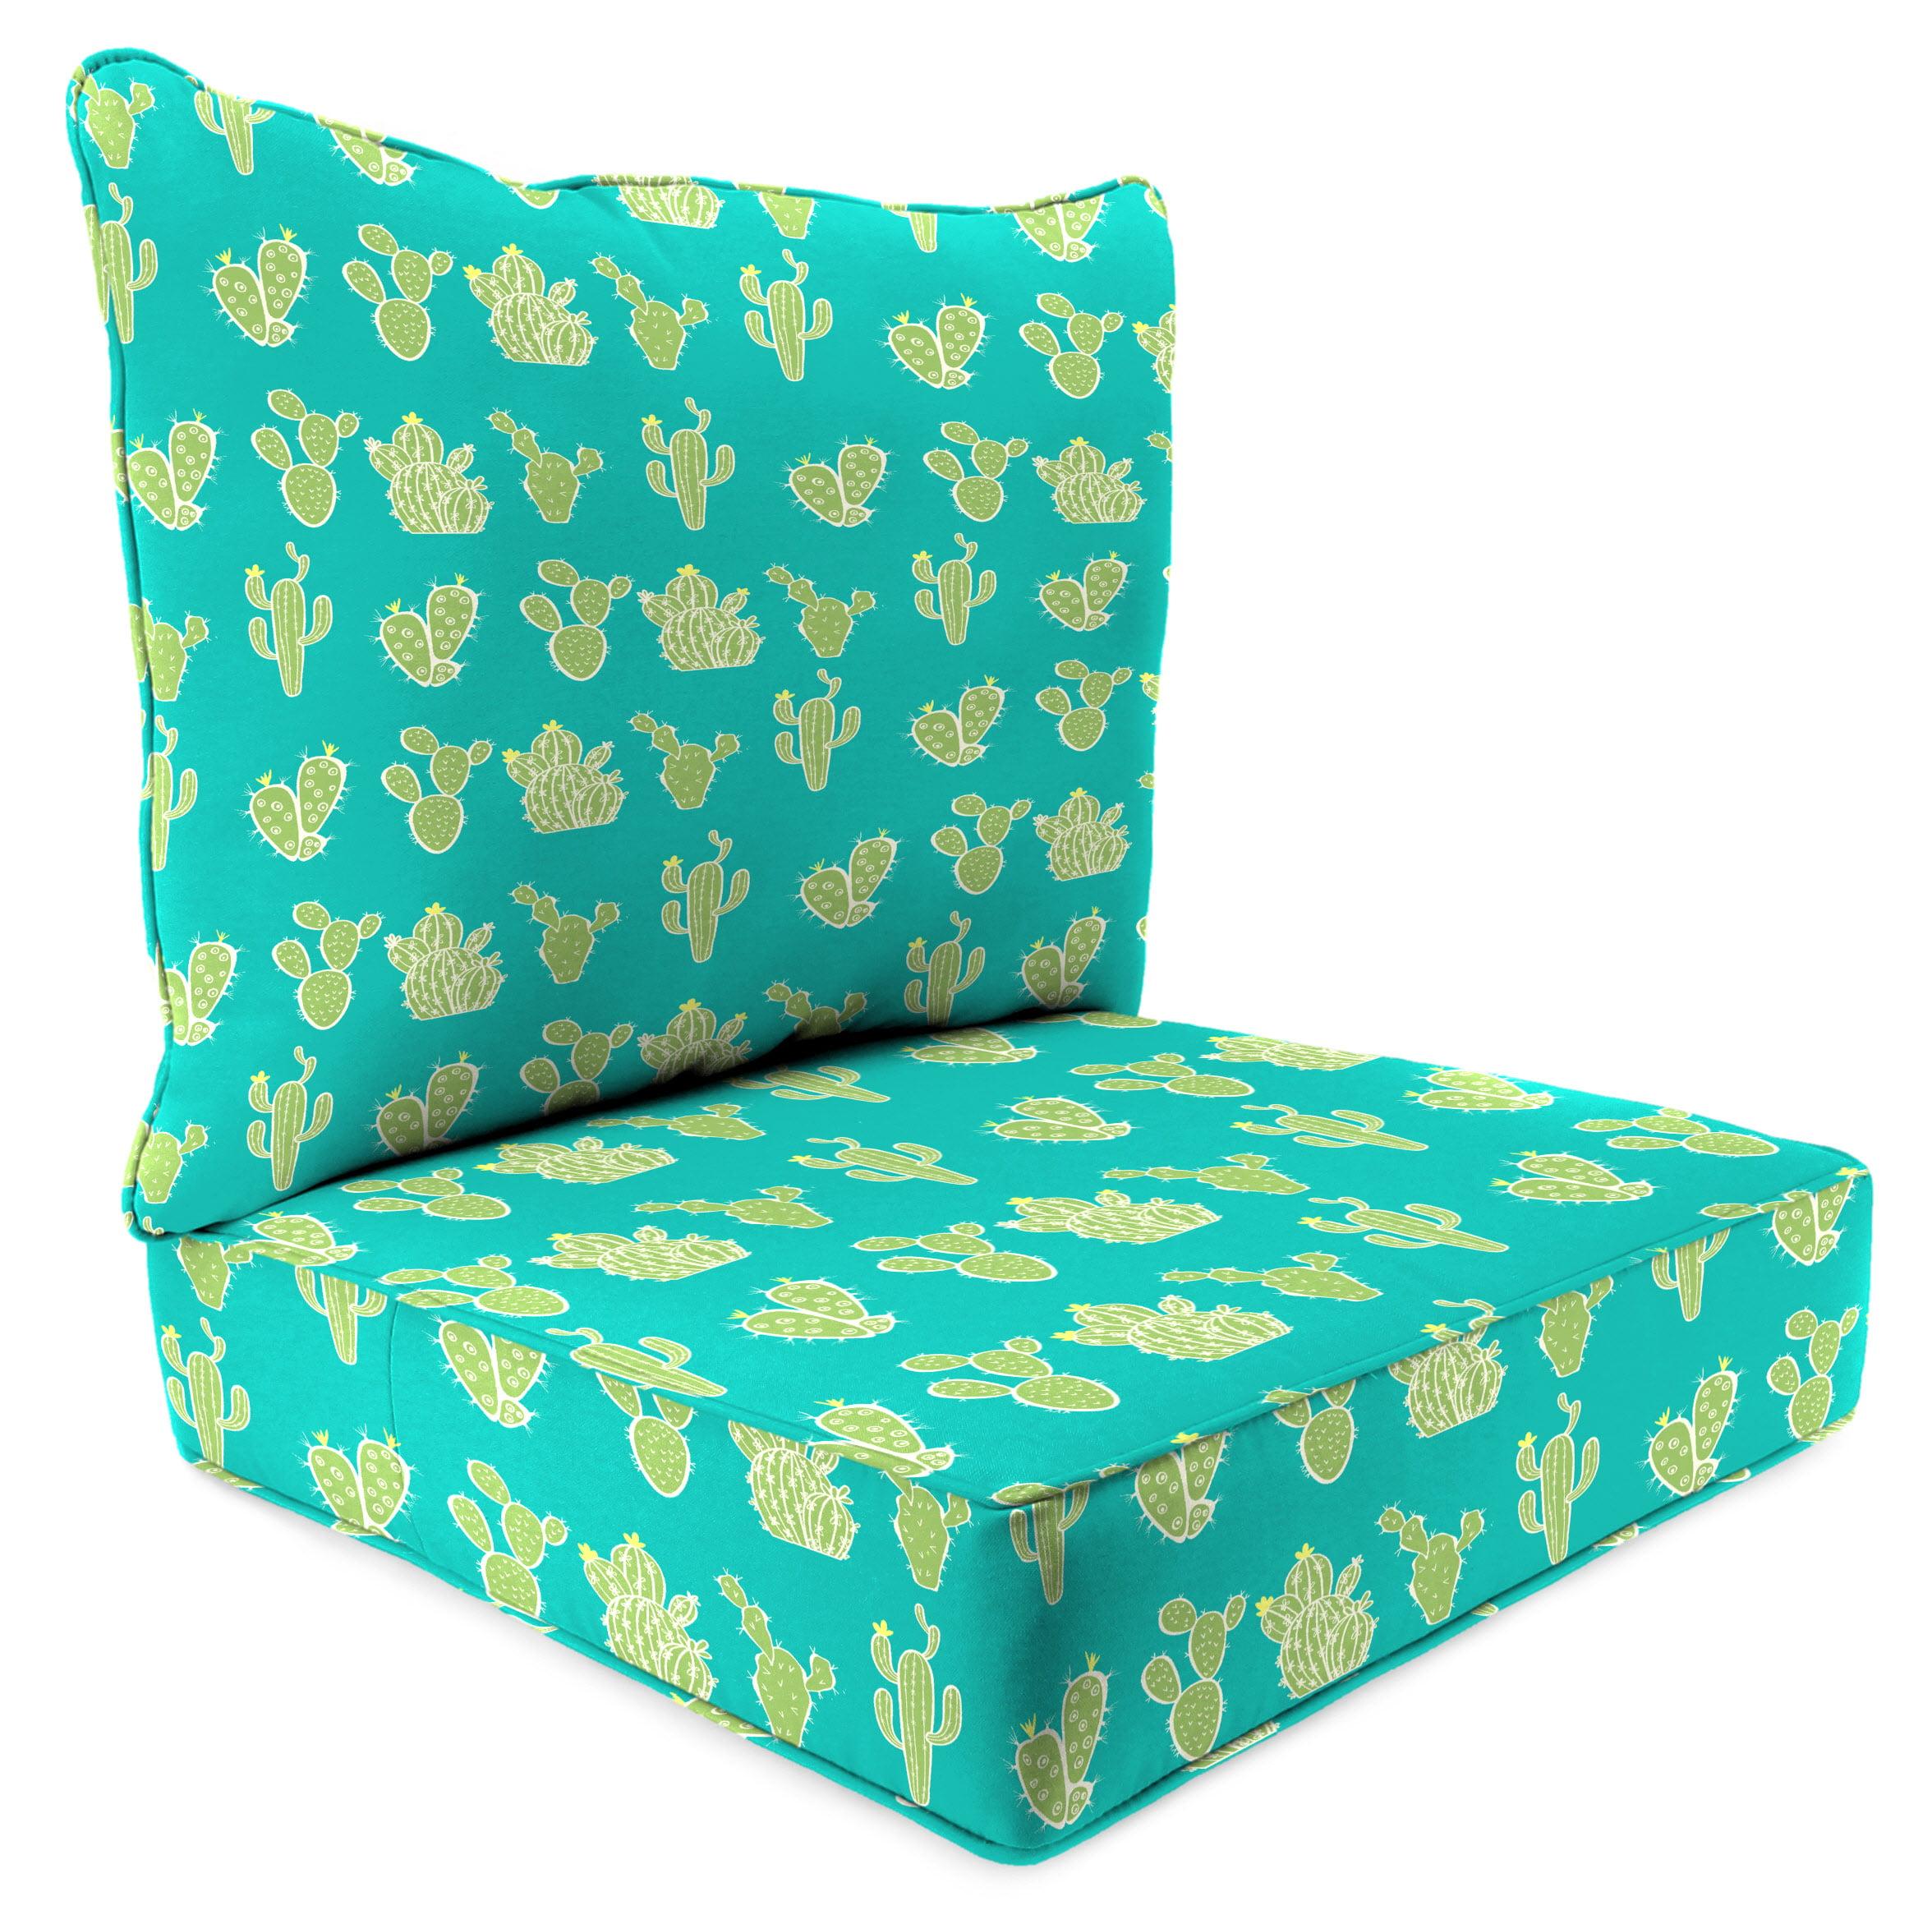 Mainstays Cactus Outdoor Deep Seating Cushion Set